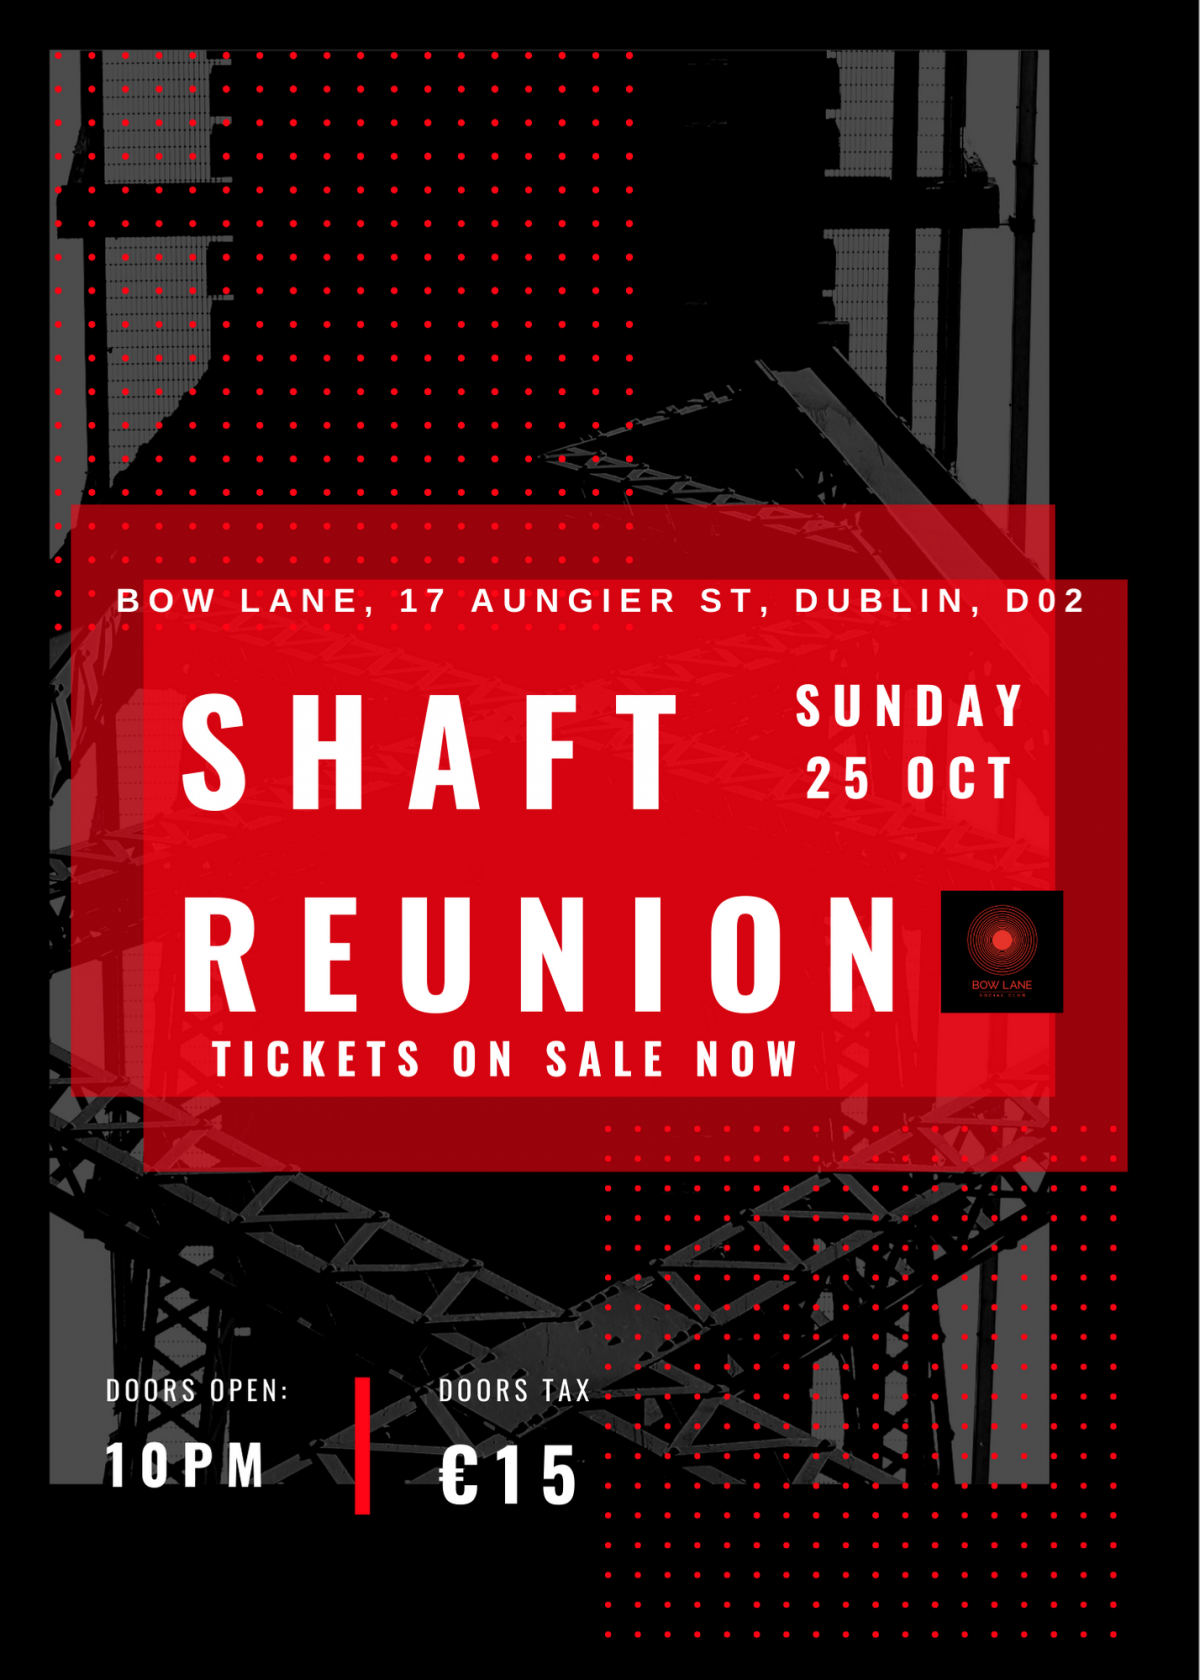 mBooked.com, Shaft Reunion, Dublin 2, Shaft Reunion